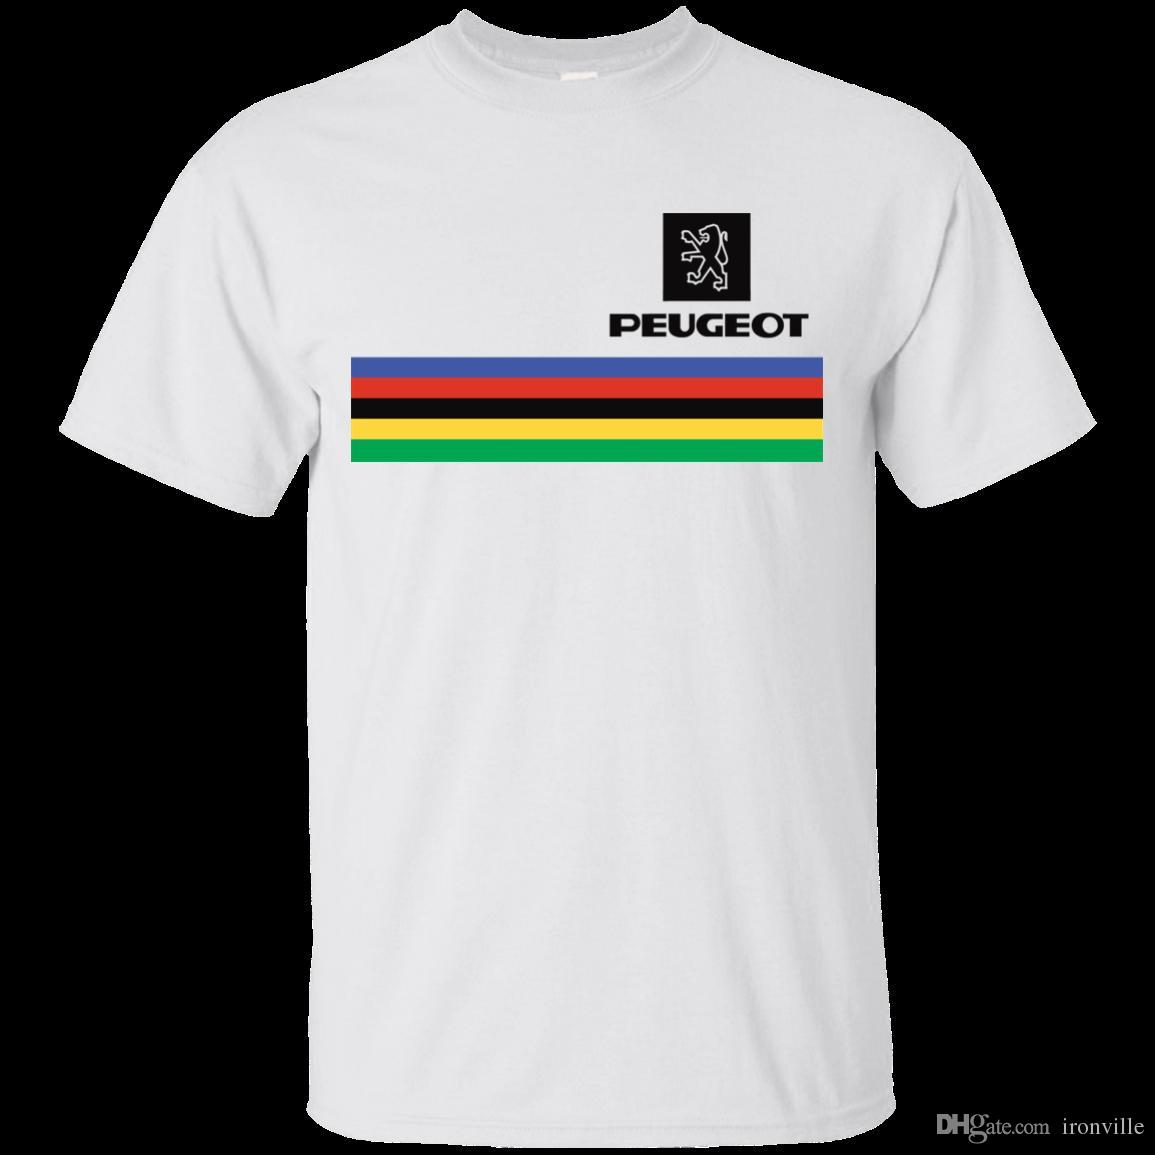 Peugeot, Bicycle, Retro, Tom Buy, Bike, Tour de France, Race, T-Shirt  Casual T-Shirt Male Short Sleeve Pattern High Quality Men T Shirts